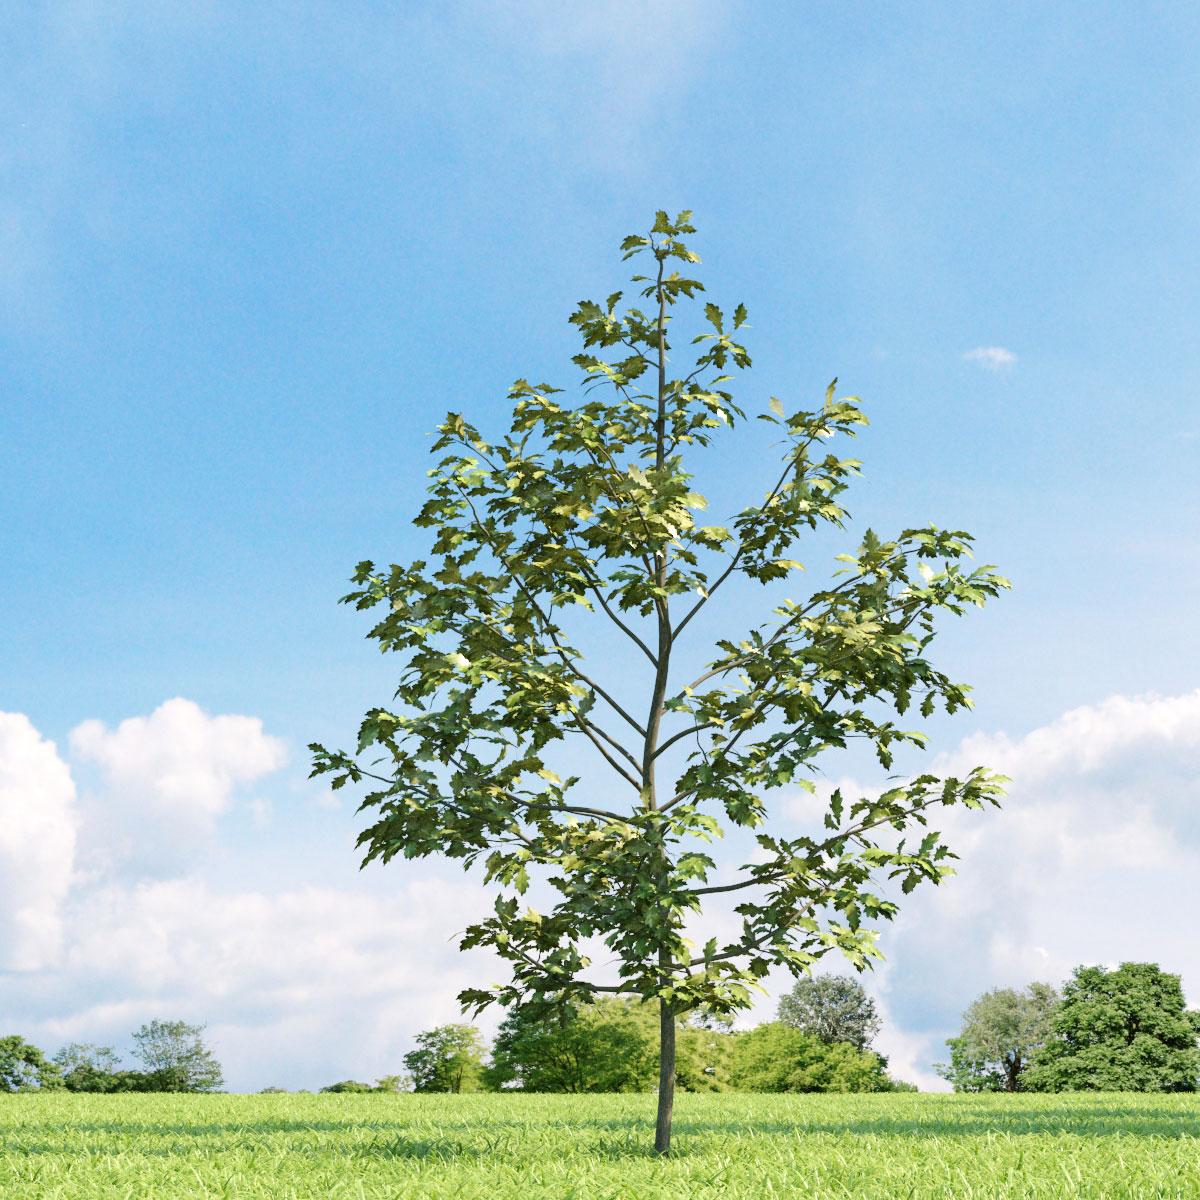 Quercus shumardii 19 v2 AM136 Archmodels